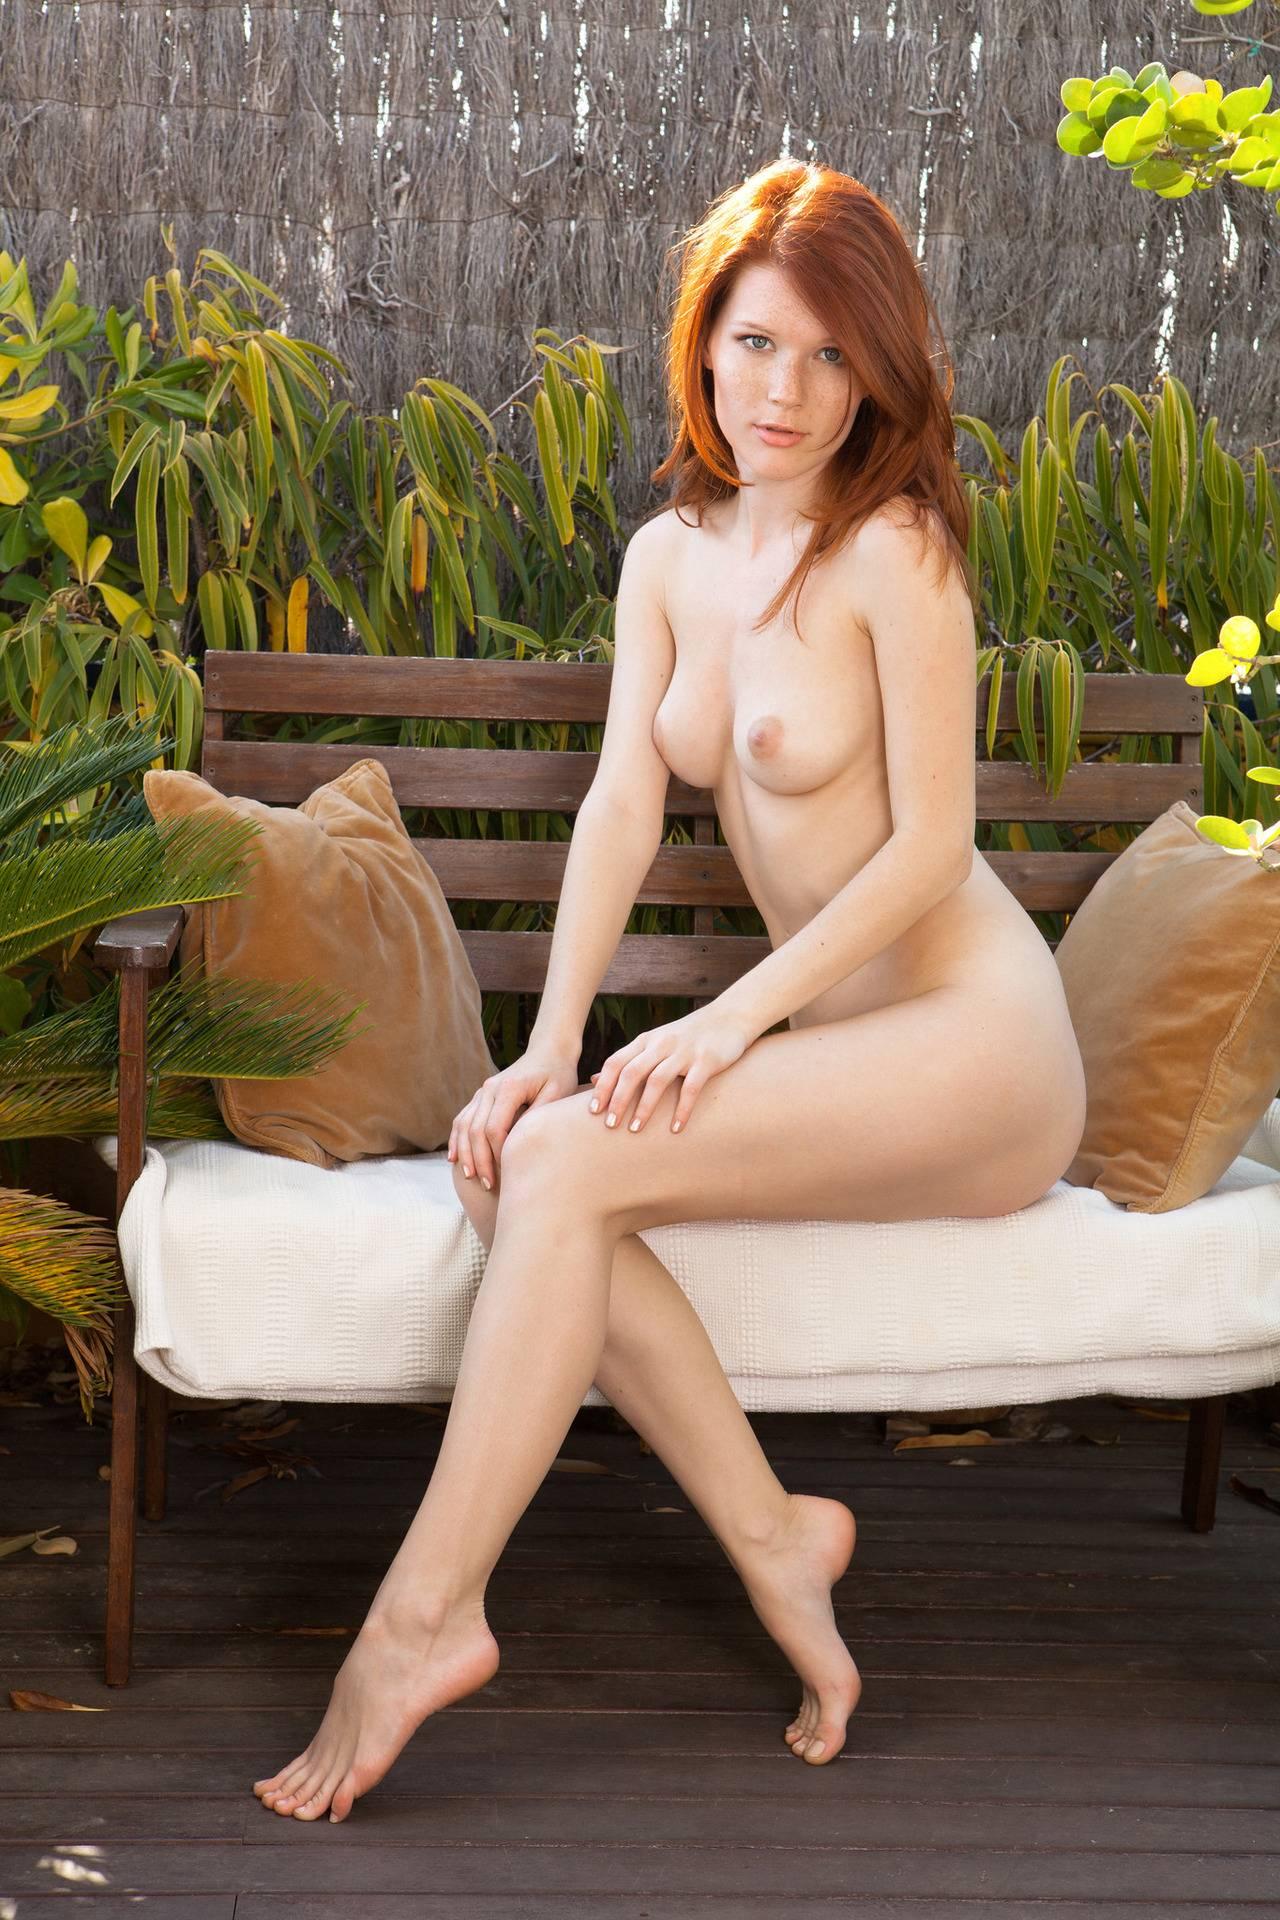 Skinny redhead long legs nude, nude big tits vids